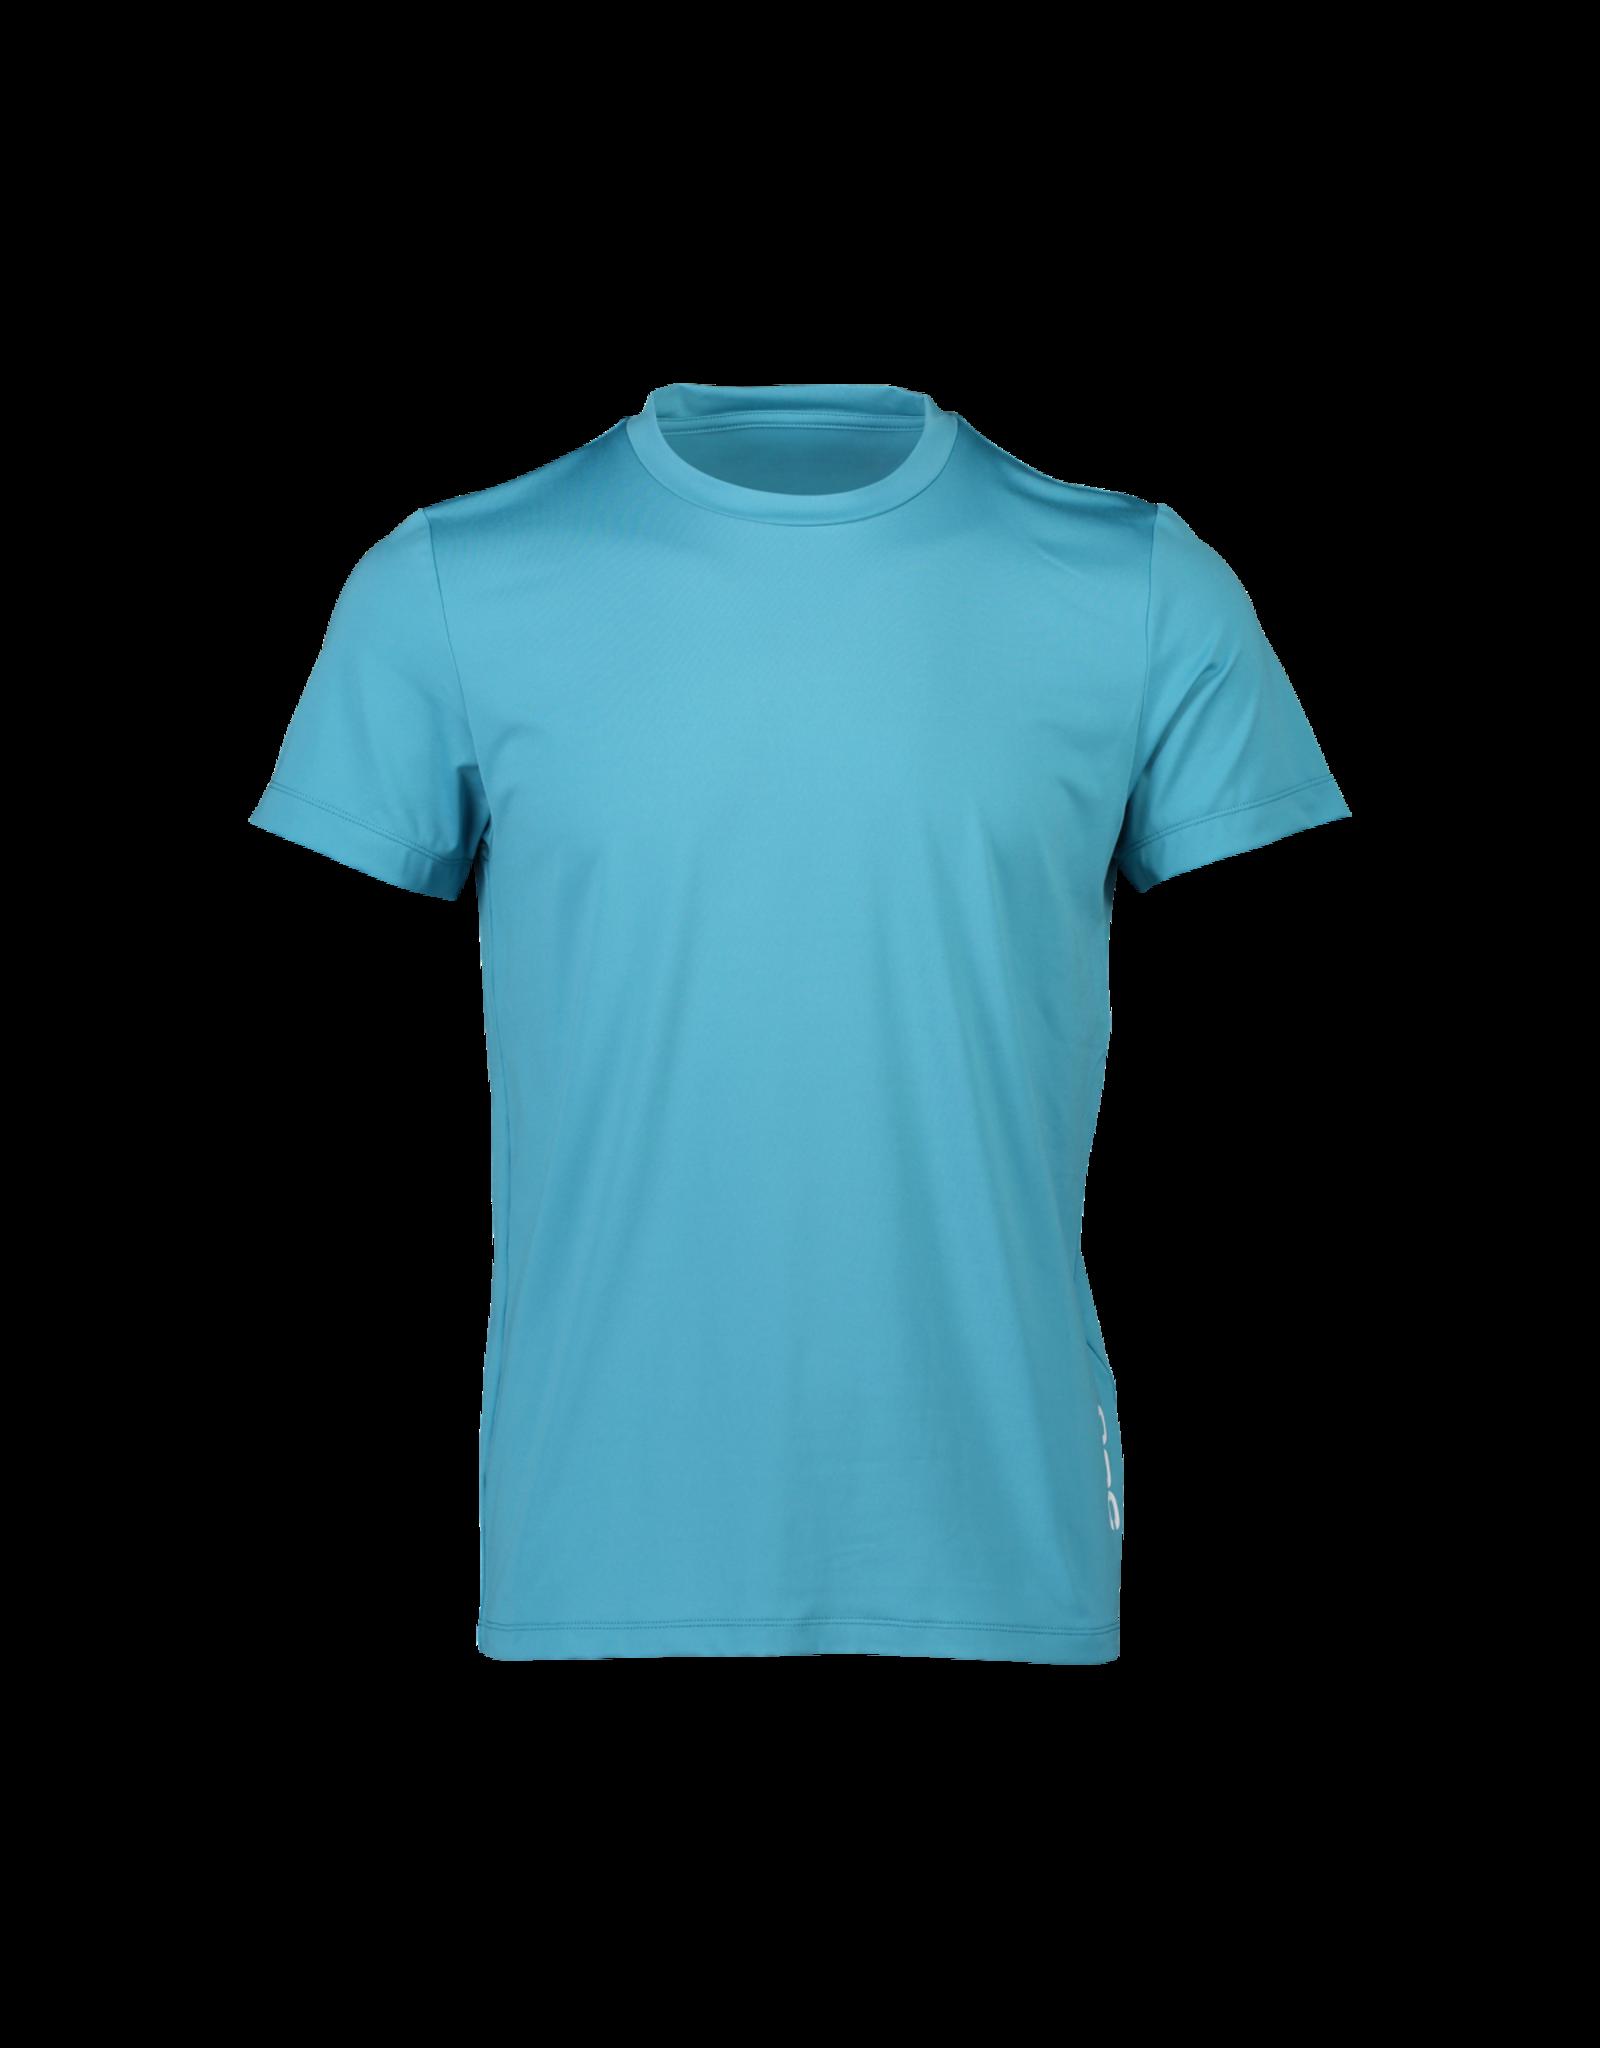 POC T-shirt POC léger Reform Enduro